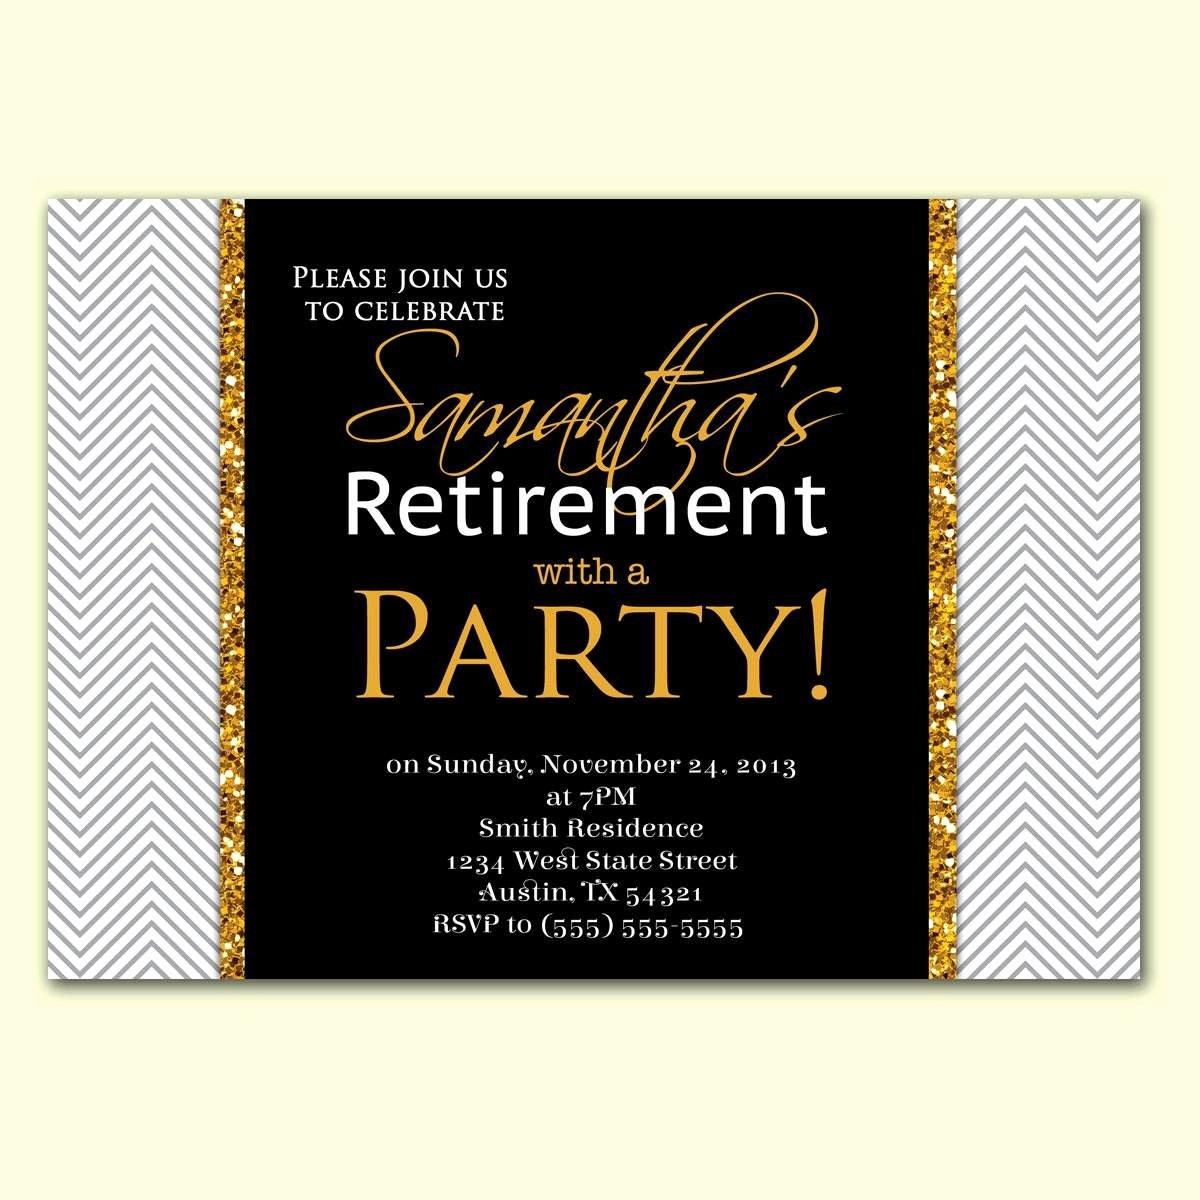 Retirement Party Invitation Templates Inspirational Retirement Party Invitation Wording In Hindi